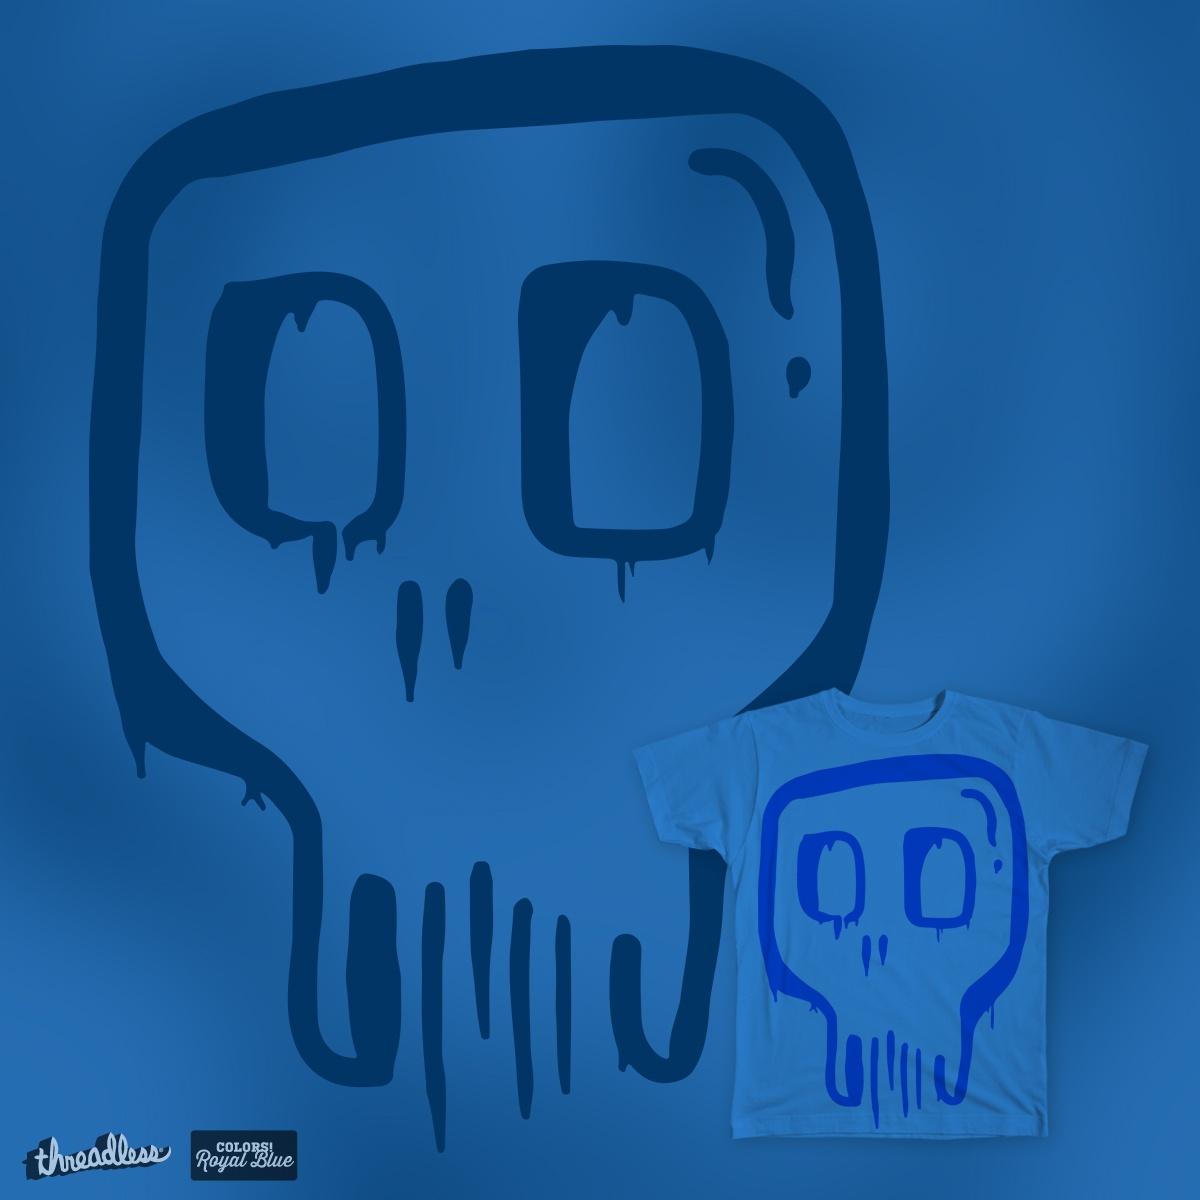 skull by AHMELOVS on Threadless